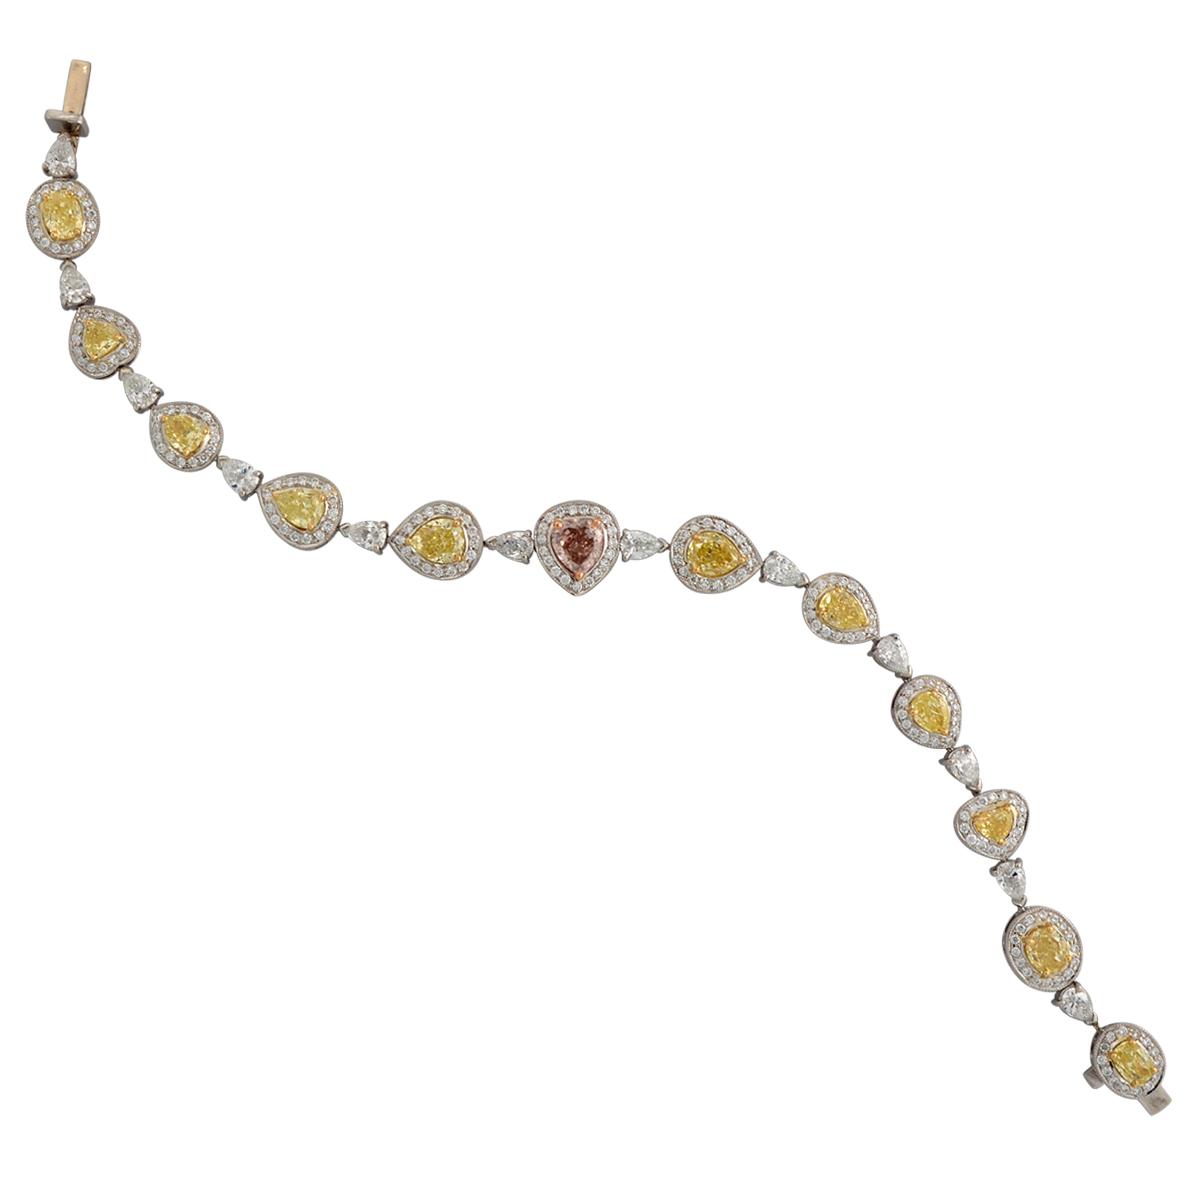 vintage jewelry gun necklace